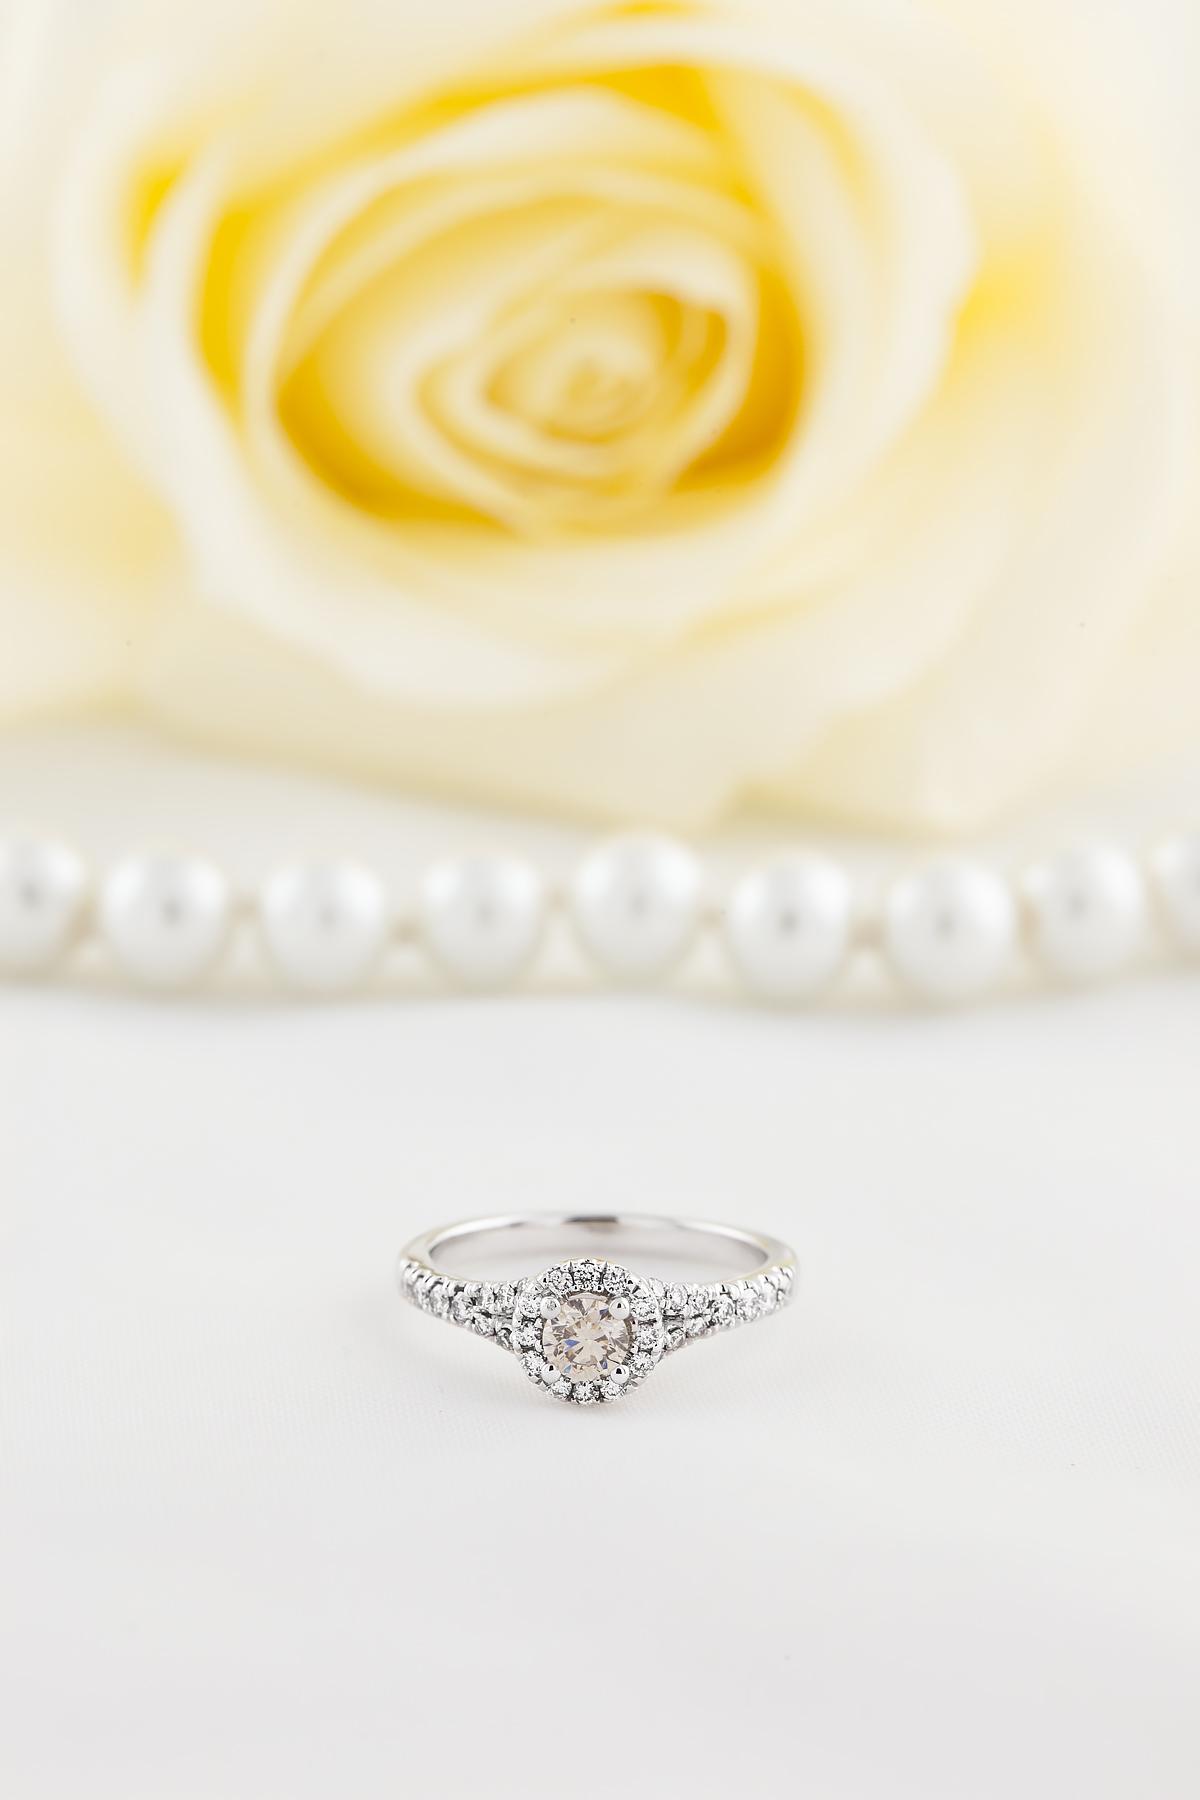 Inel Cocktail/ Inel de Logodna cu Diamante Dama Aur Alb 18kt cu un Briliant Rotund Central Sampanie si Diamante Laterale Albe Stralucitoare, Stil Halo-img1